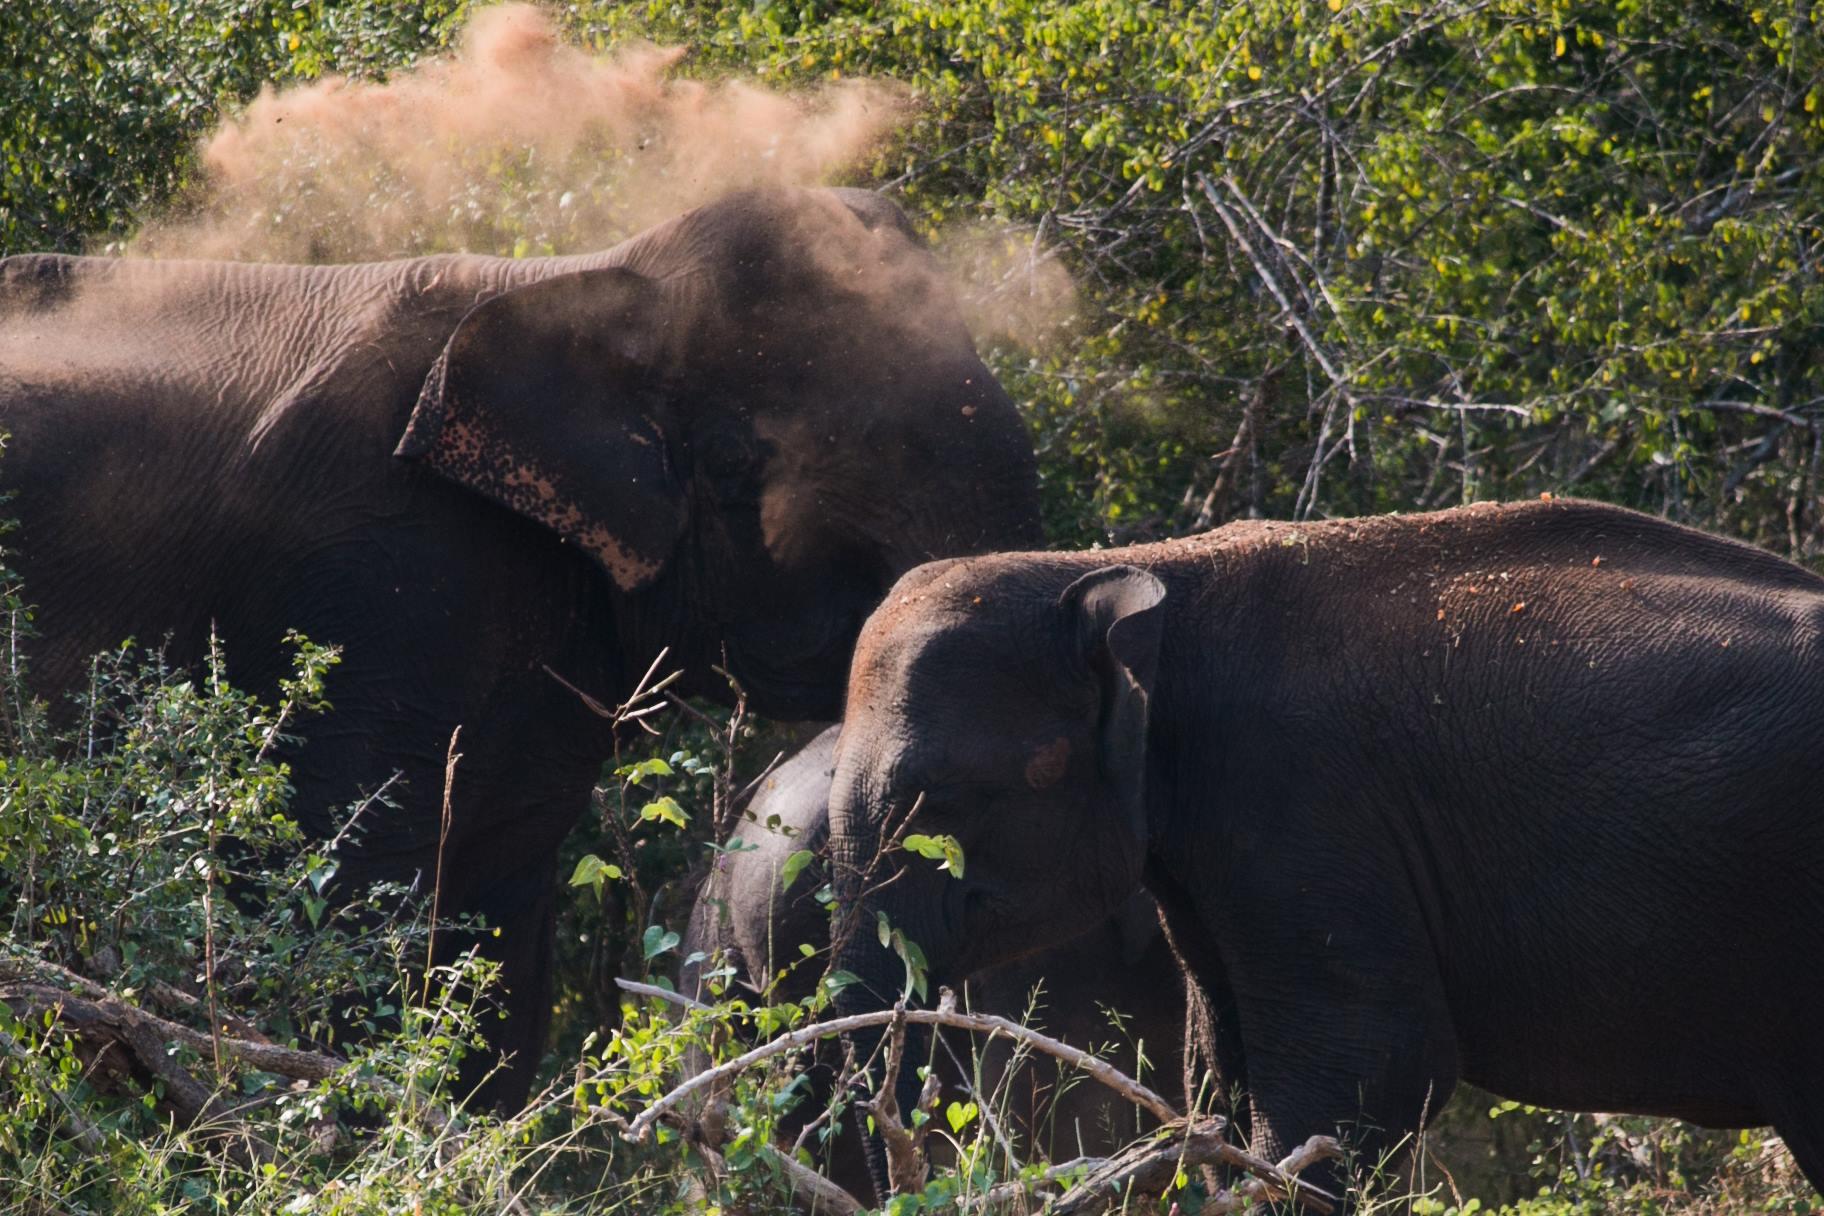 invite-to-paradise-sri-lanka-and-maldives-specialists-travel-agent-tour-operator-customer-review-feedback-joel-rhian-elephants-2.jpg